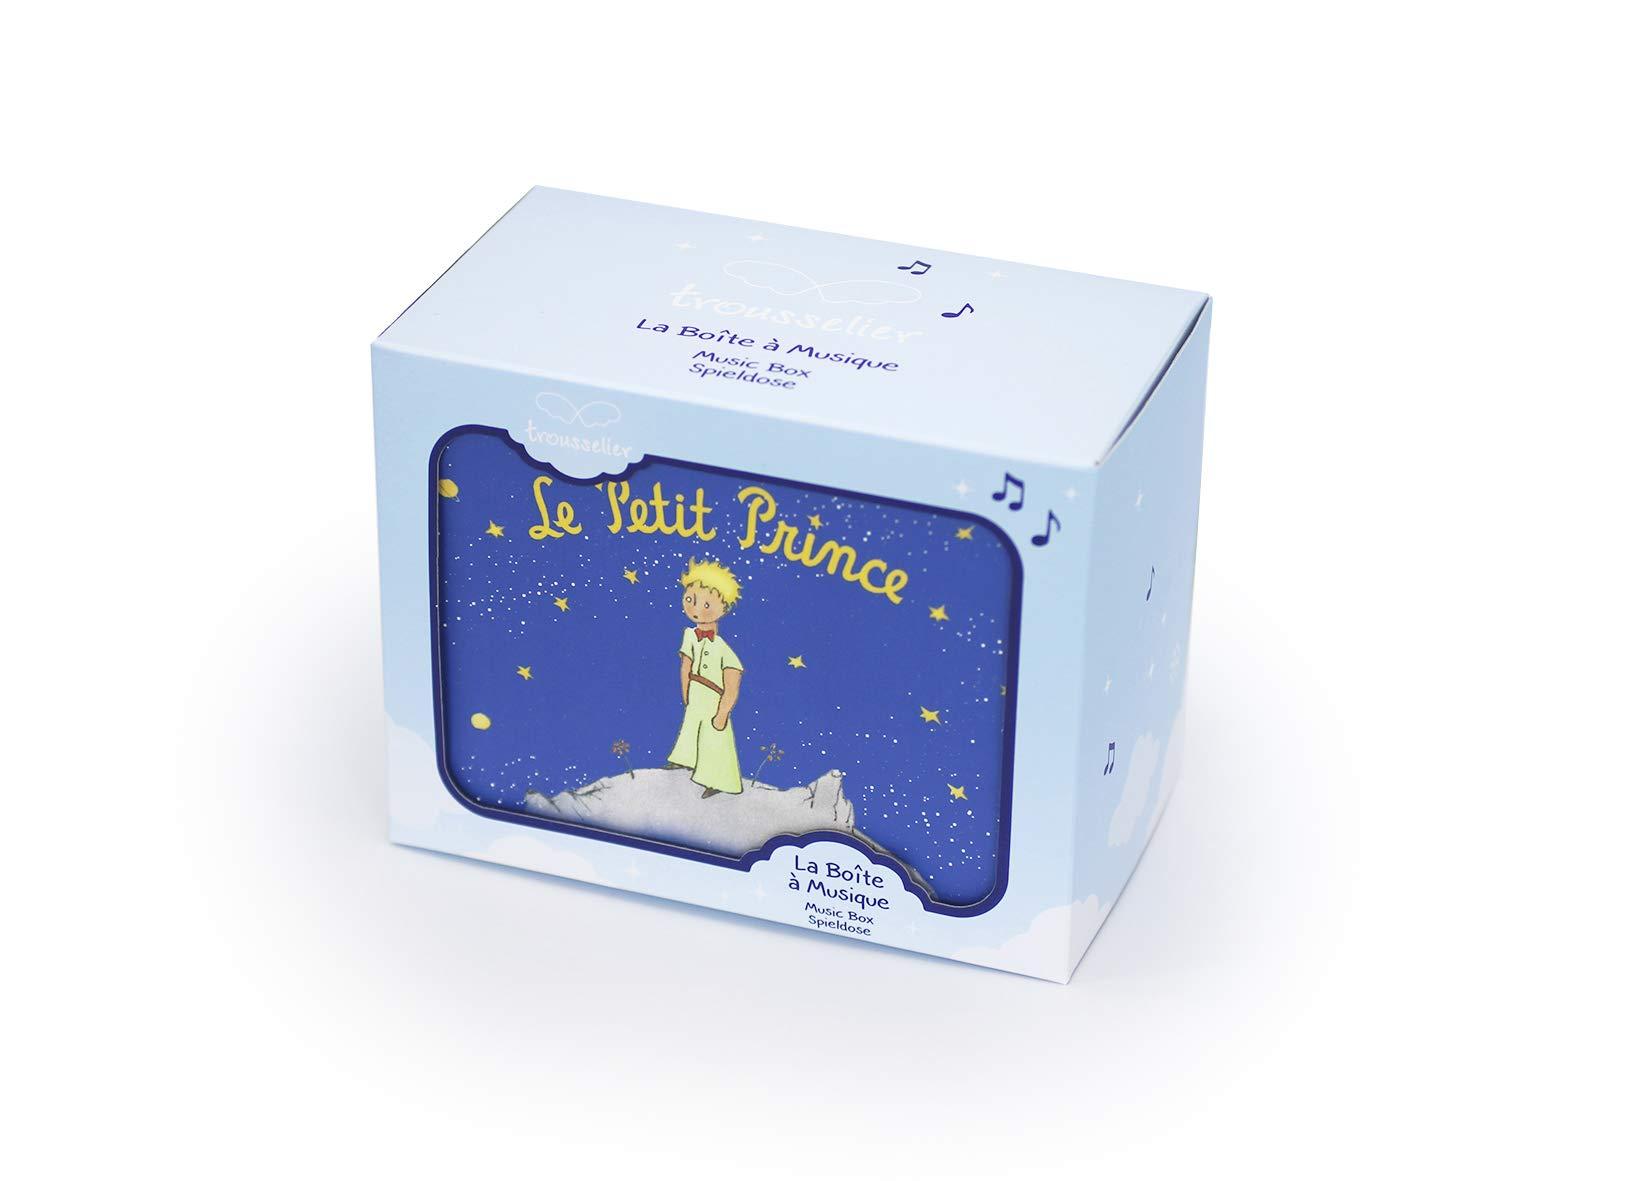 Trousselier - Little Prince - Photoluminescent Music Box - Glow in The Dark - Dark Blue